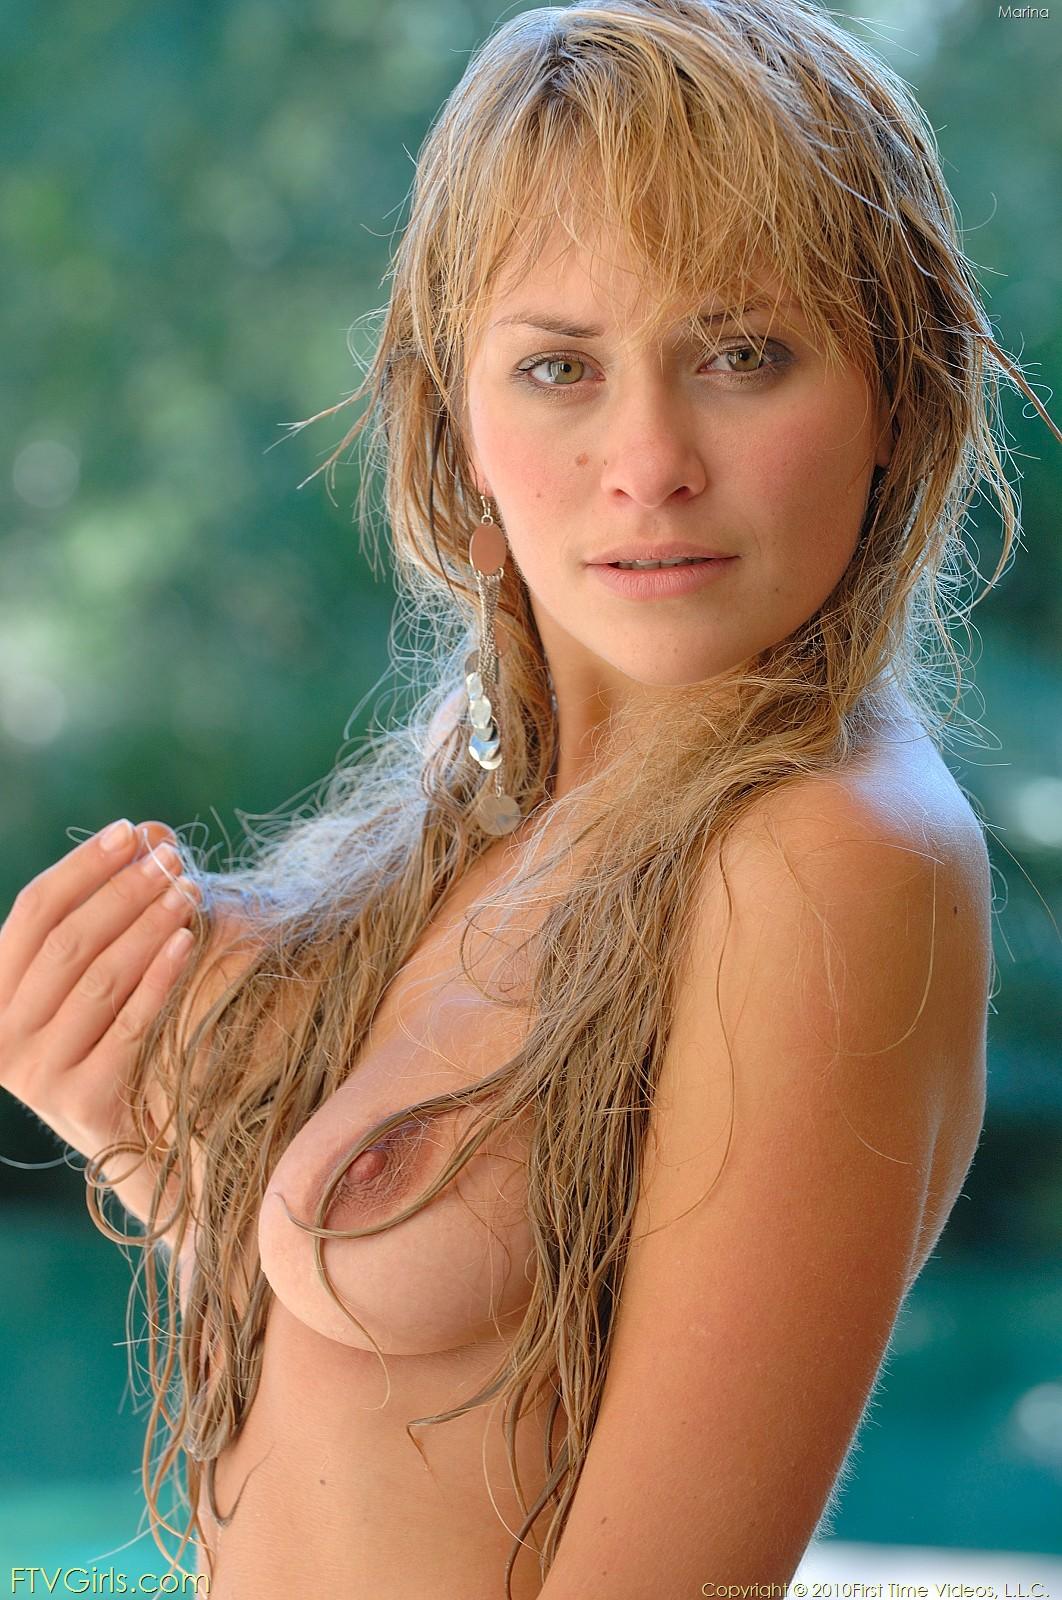 wpid-marina-shows-off-her-sweet-tits8.jpg